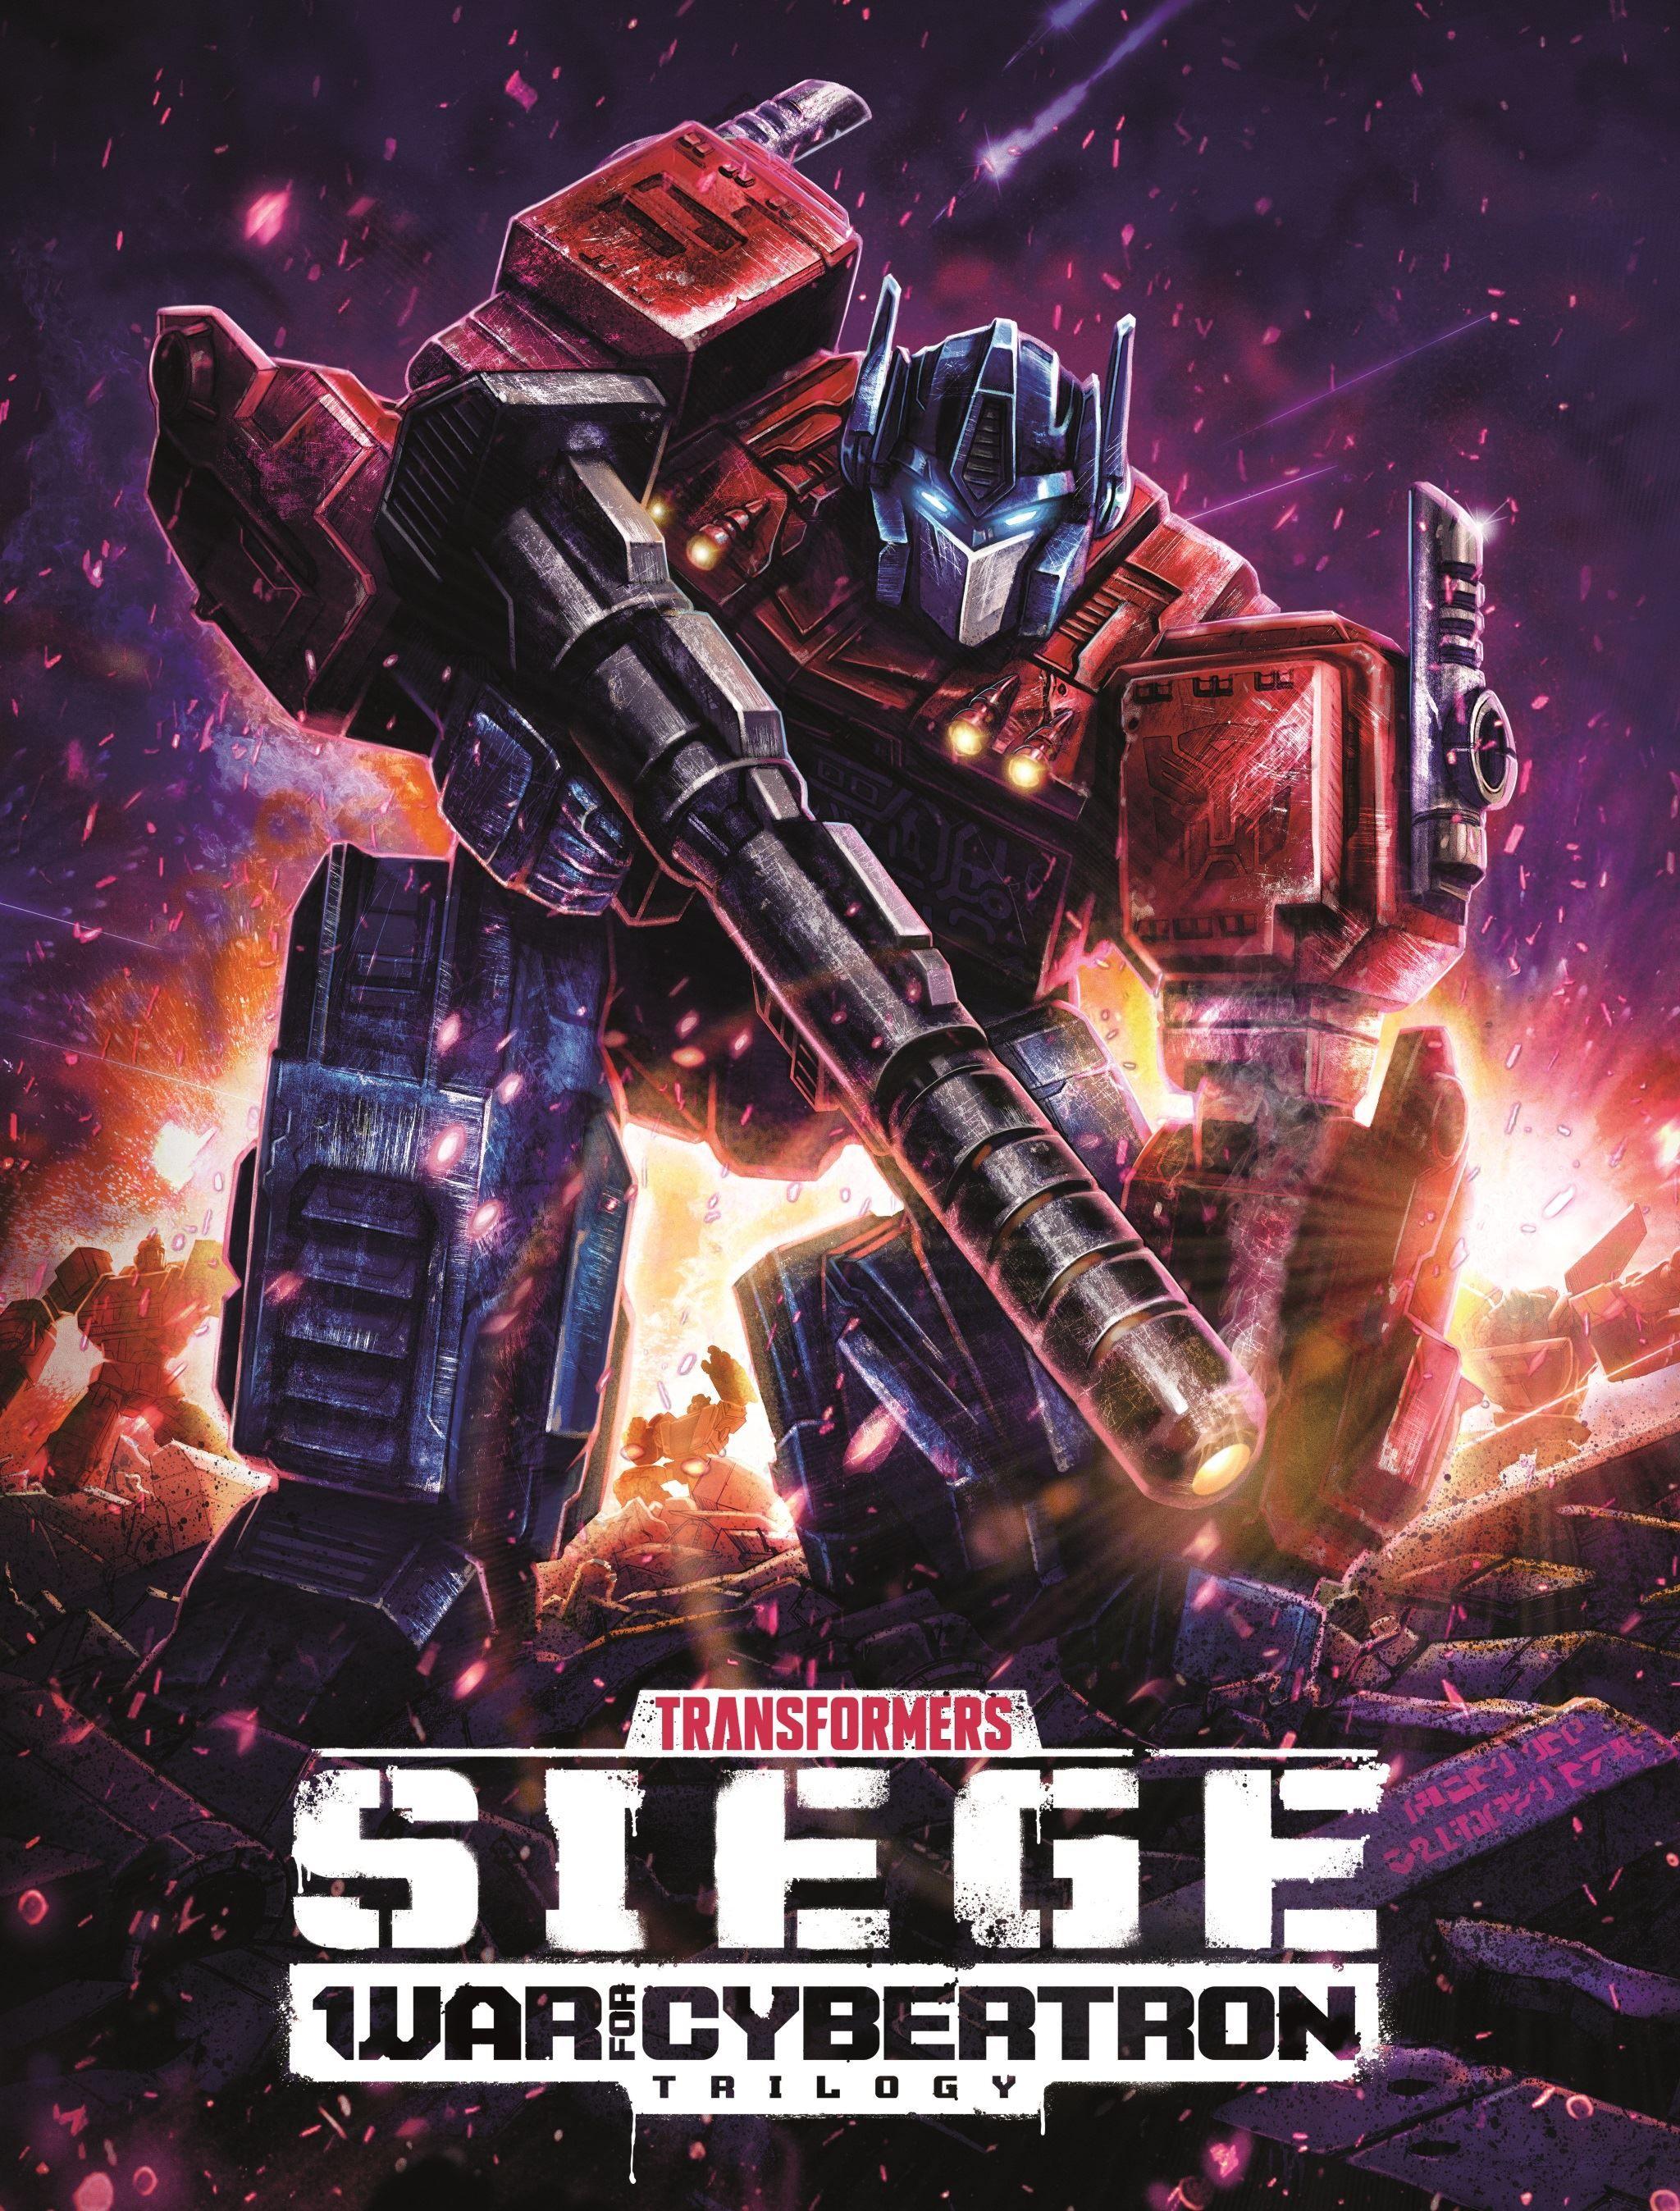 Resultado de imagen de Transformers: War For Cybertron Trilogy: Siege